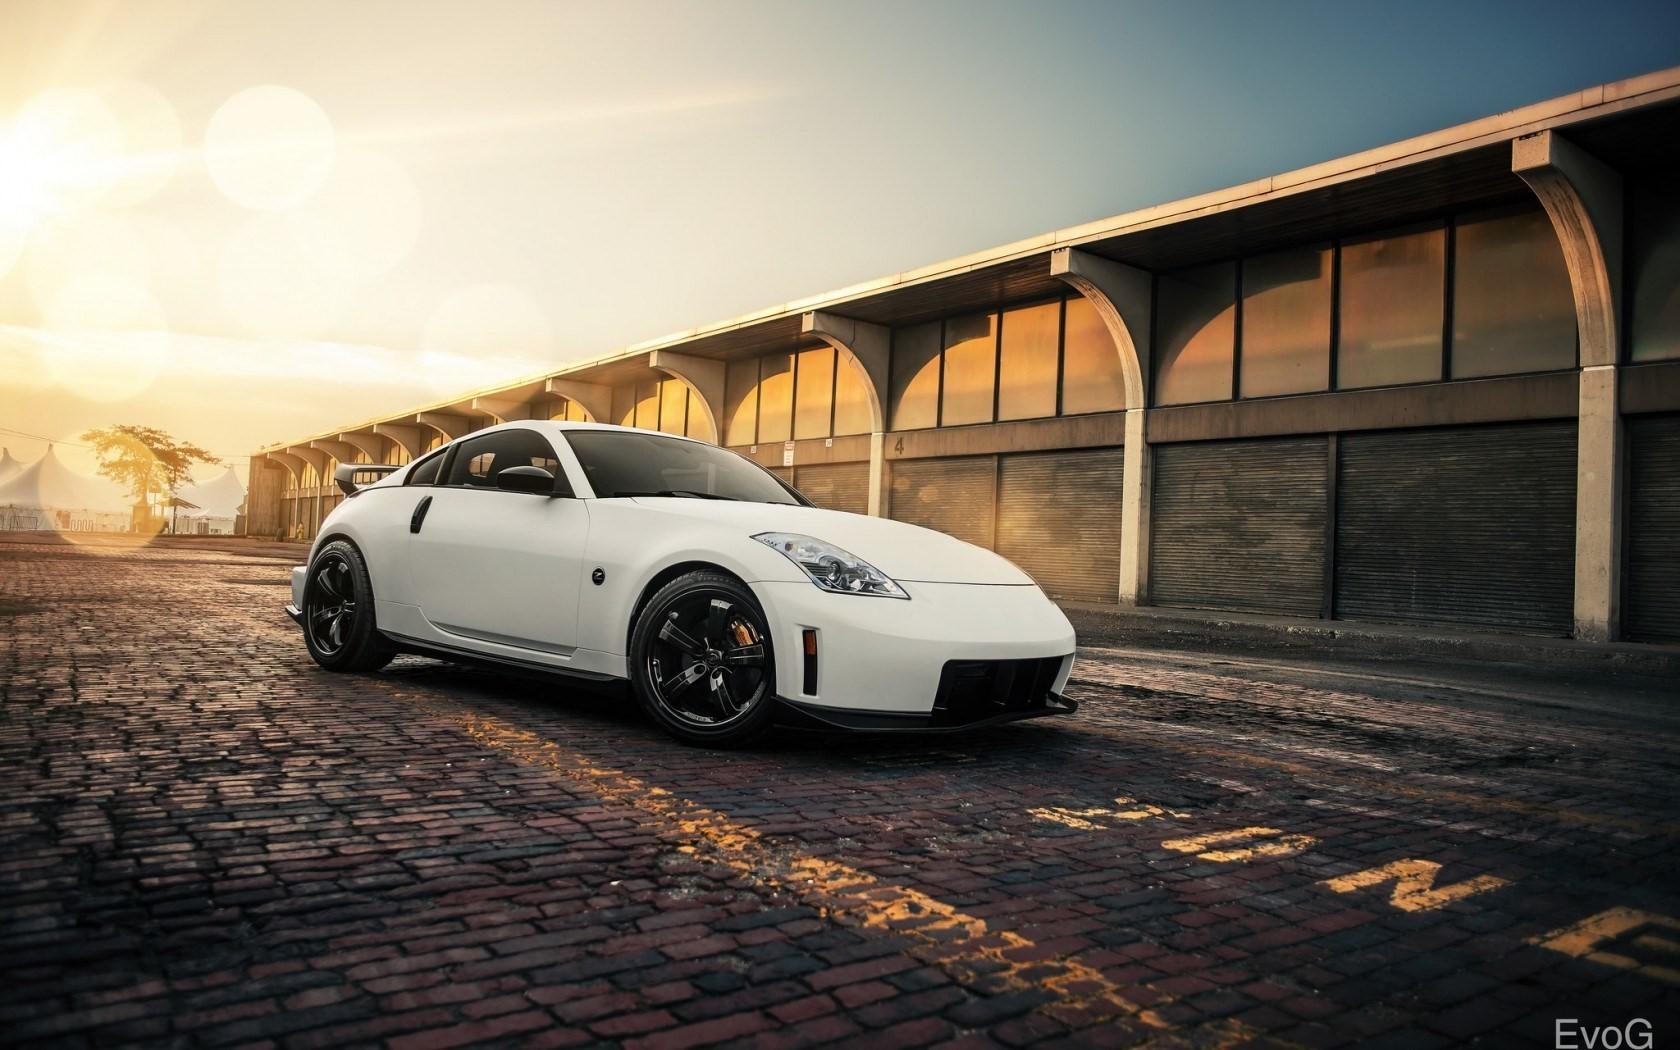 wallpaper : sunlight, architecture, sports car, nissan 350z, wheel